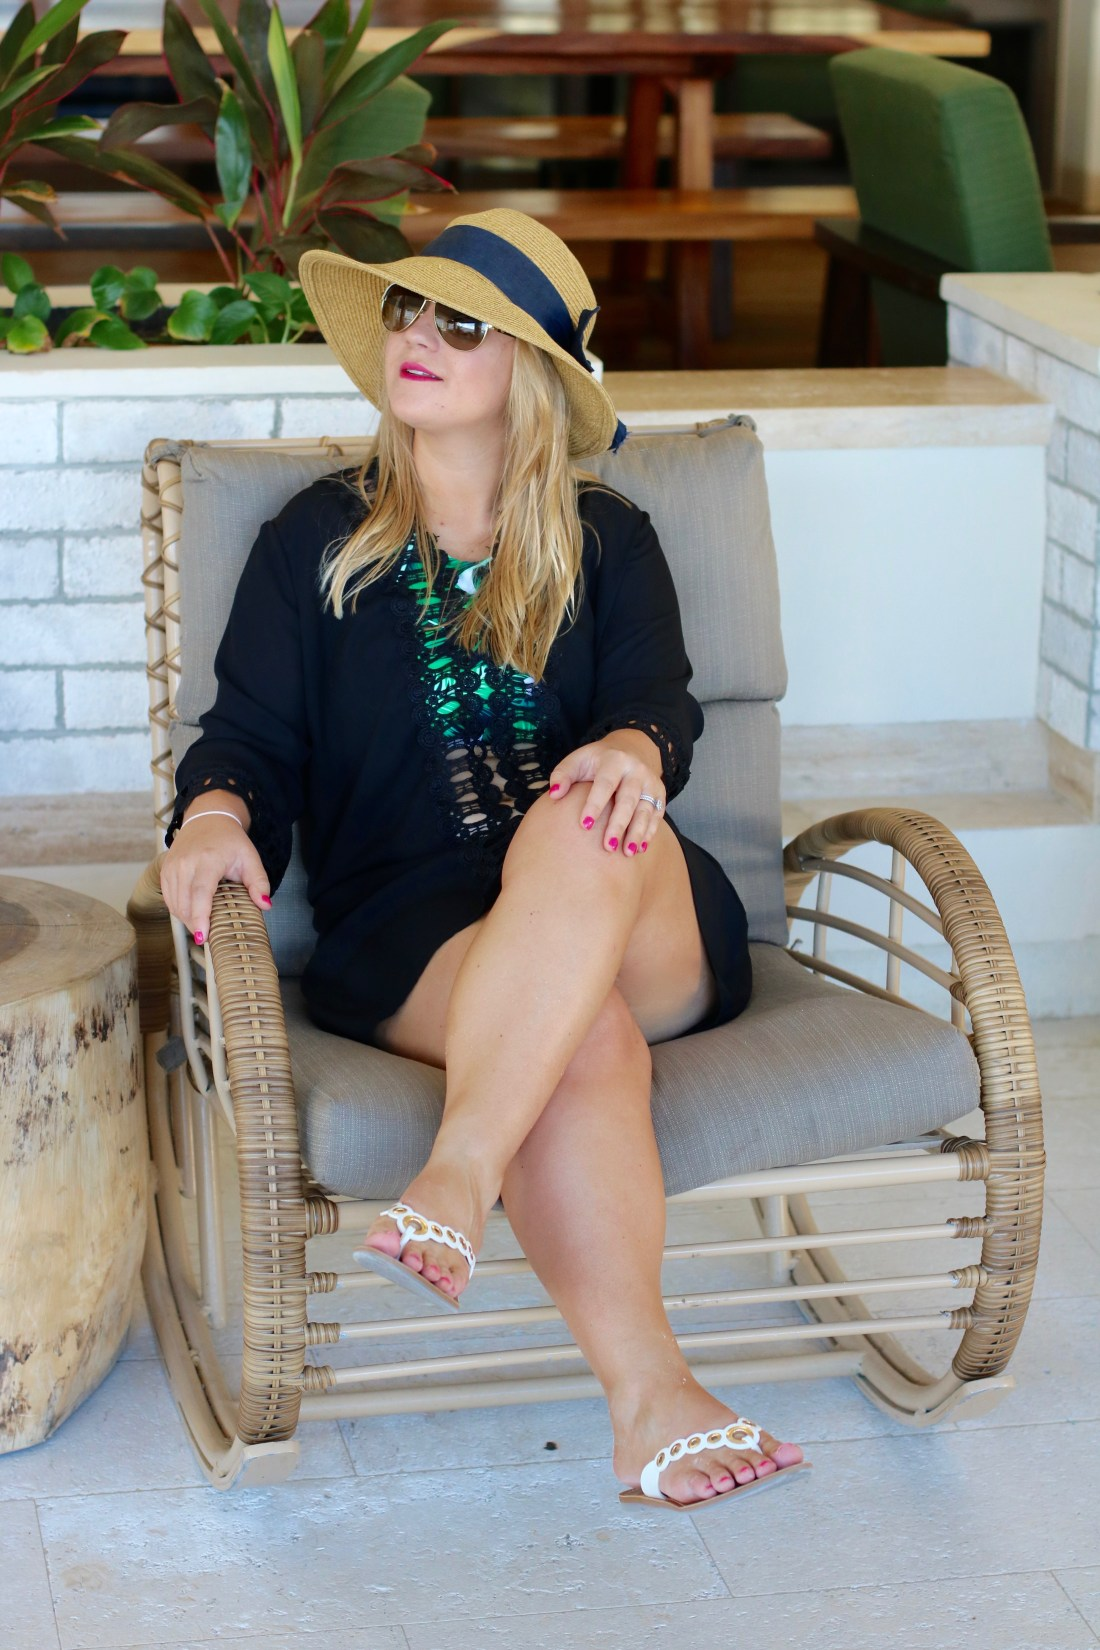 Amazon Prime Swimwear #Fashion #Beach #HyattZiva #Cancun